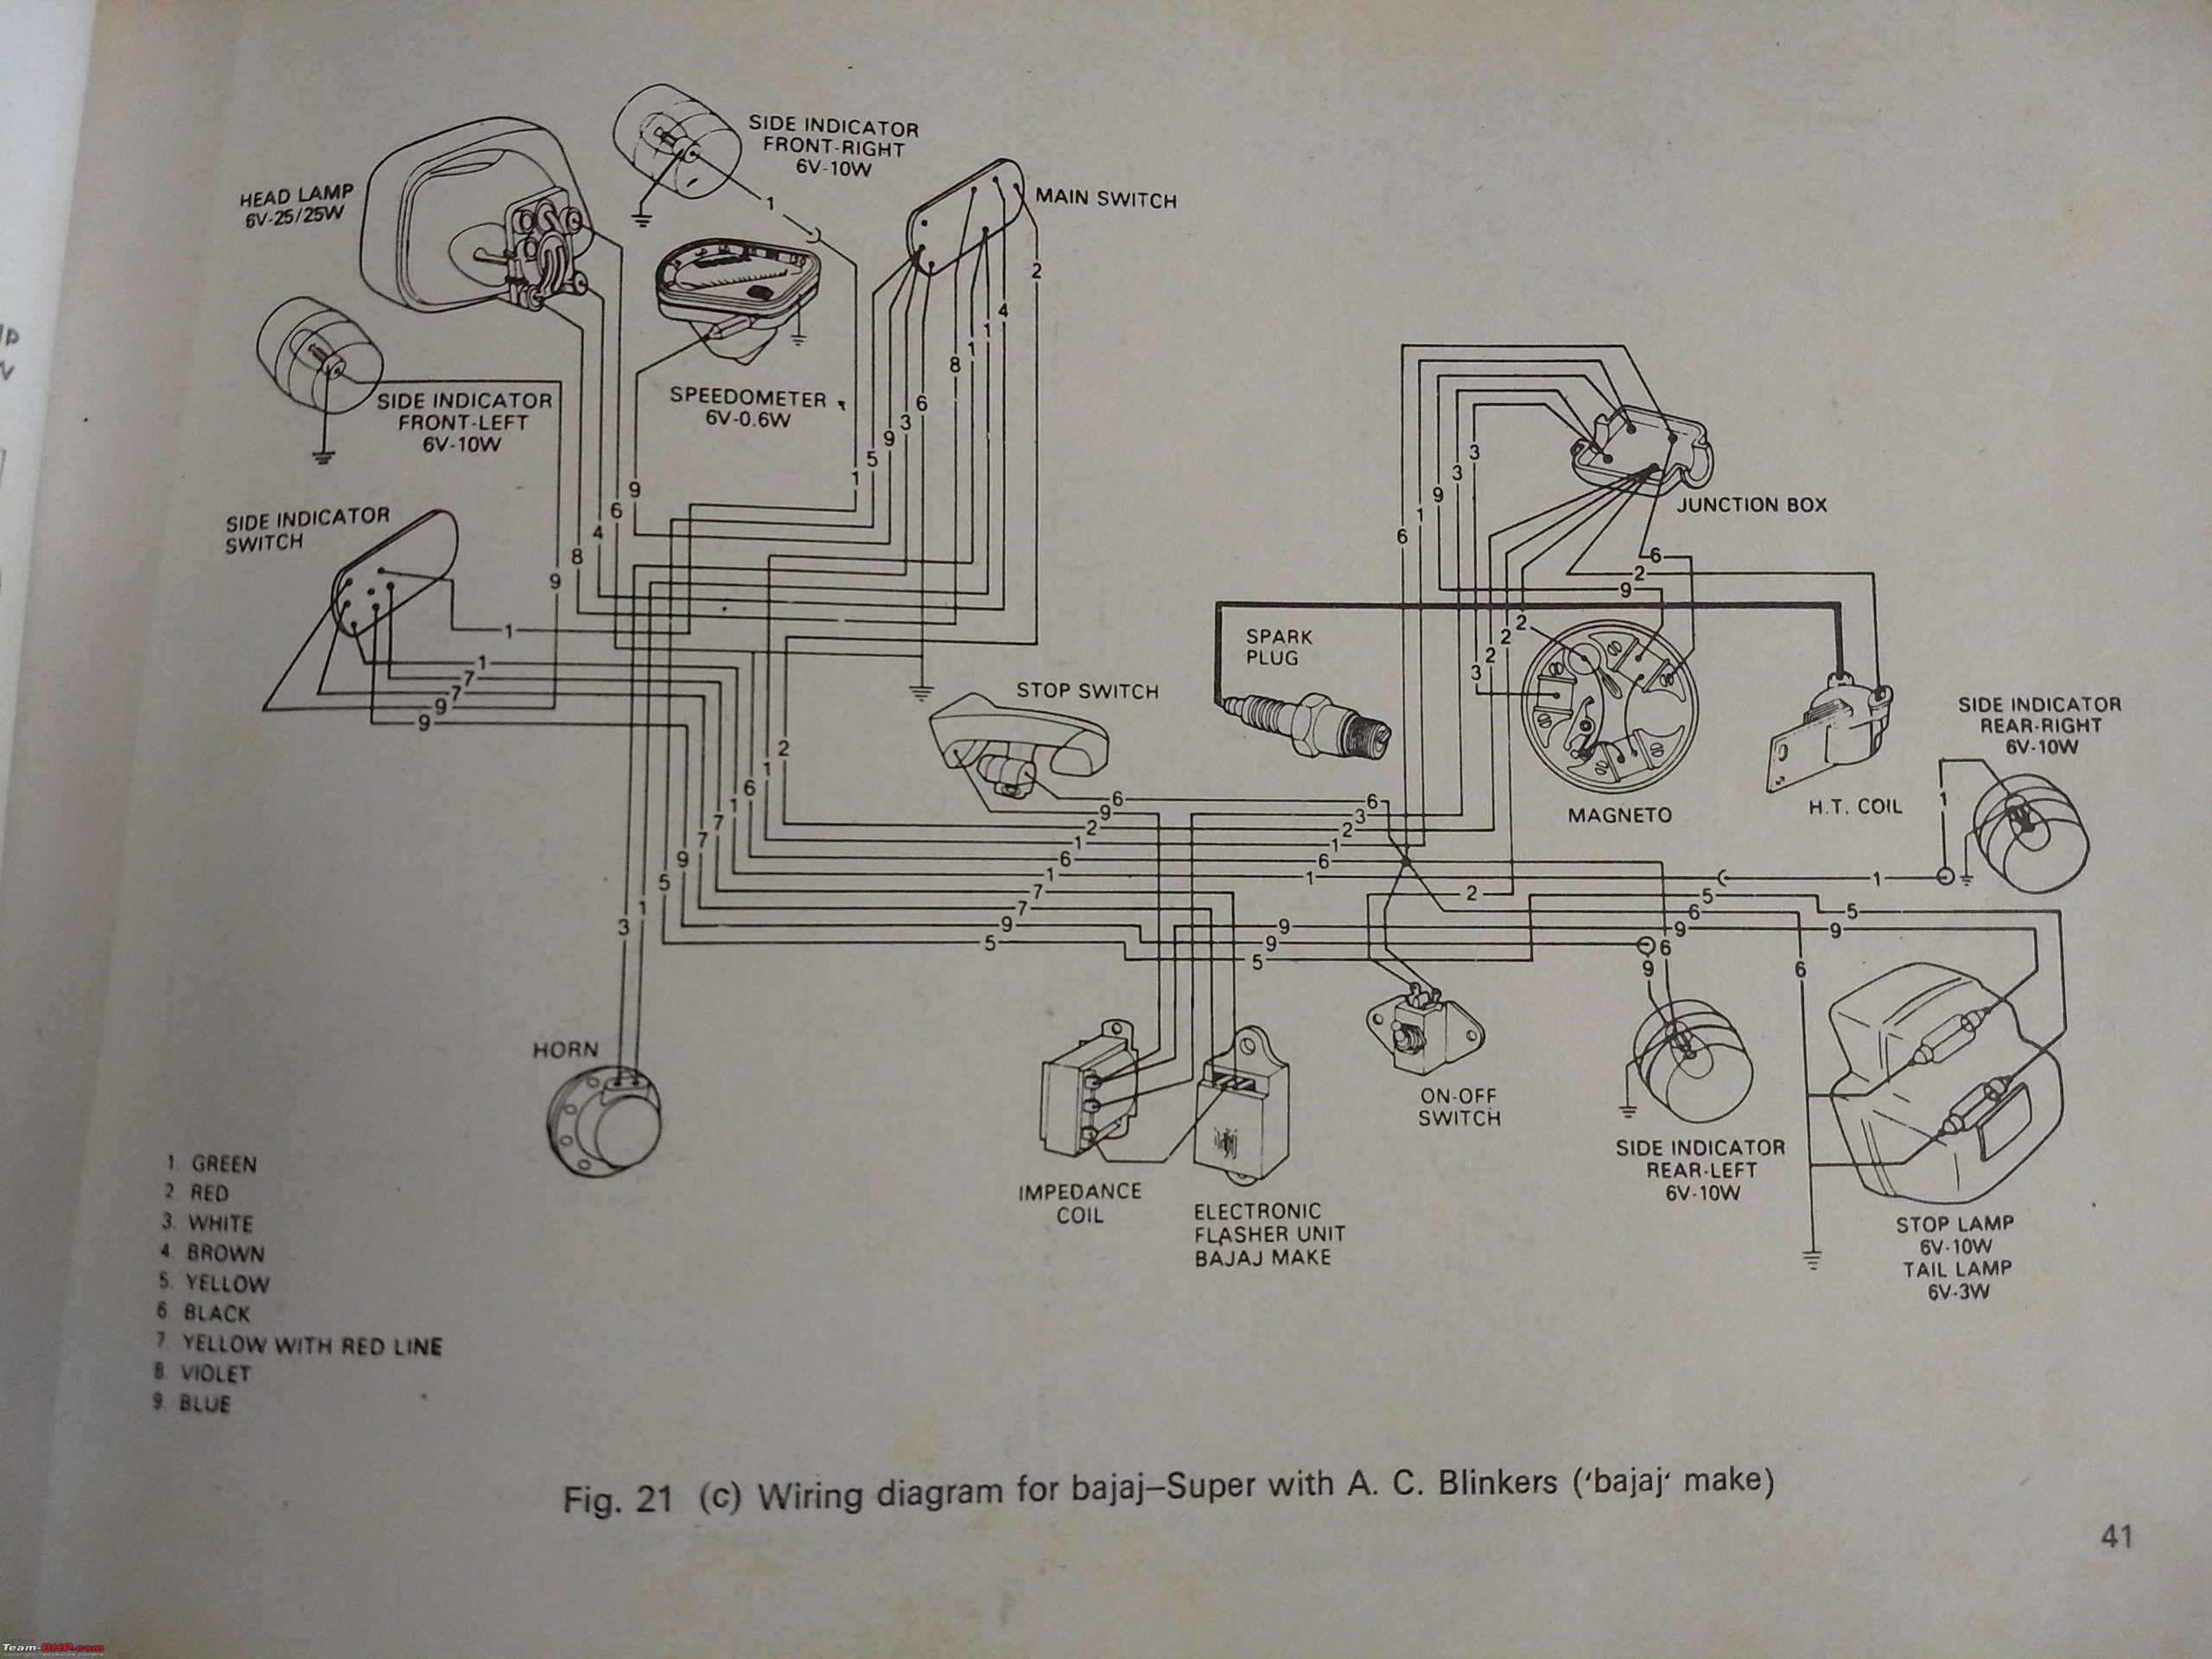 Hero Honda Splendor Engine Diagram Pdf In 2020 Diagram Design Hero Engineering